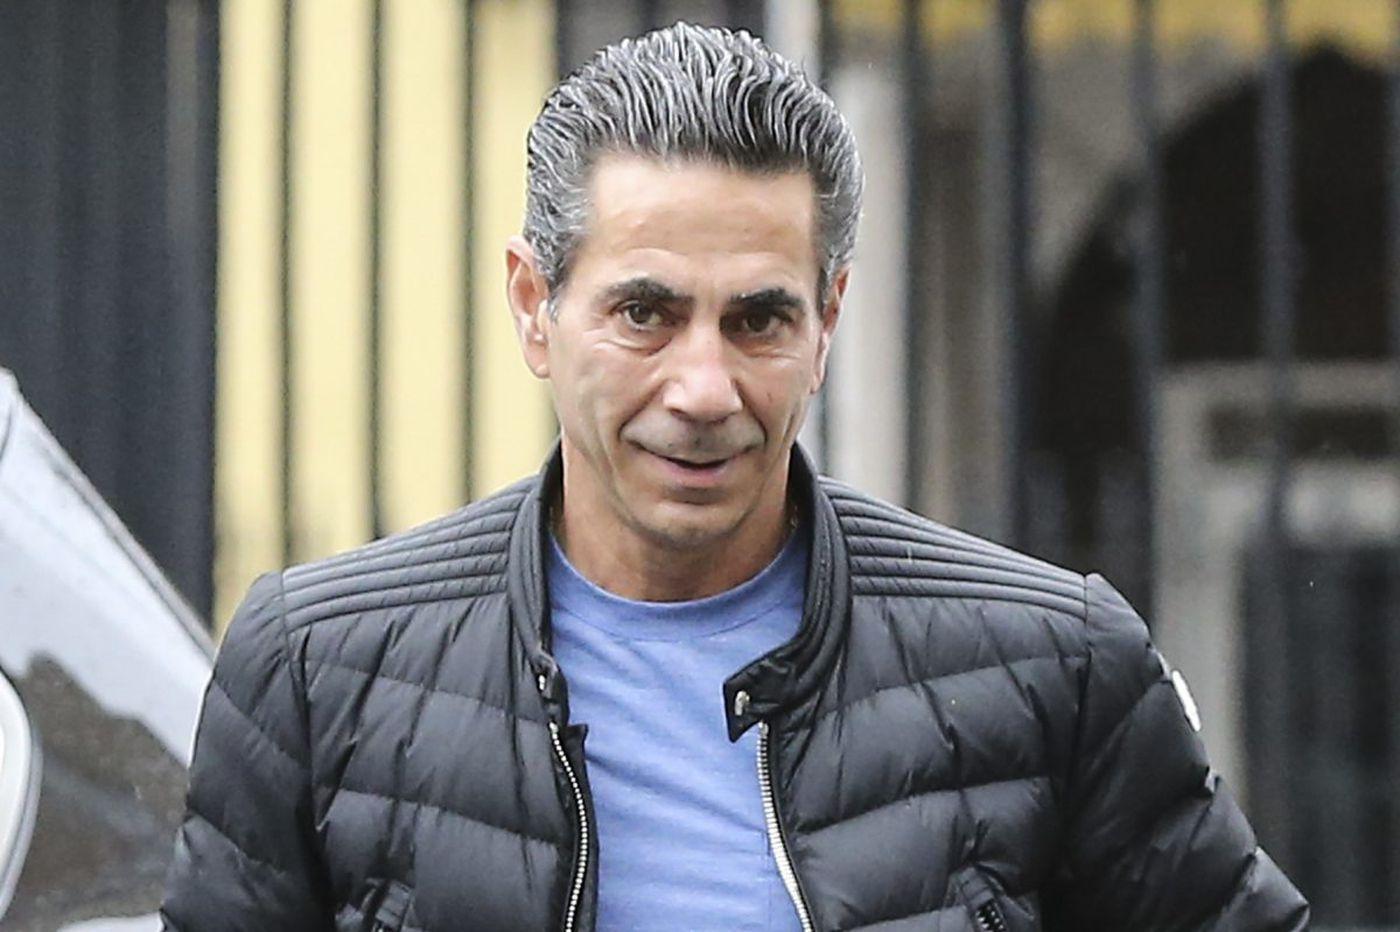 Mistrial for Merlino: Deadlocked jury ends NYC trial of reputed mob boss 'Skinny Joey'